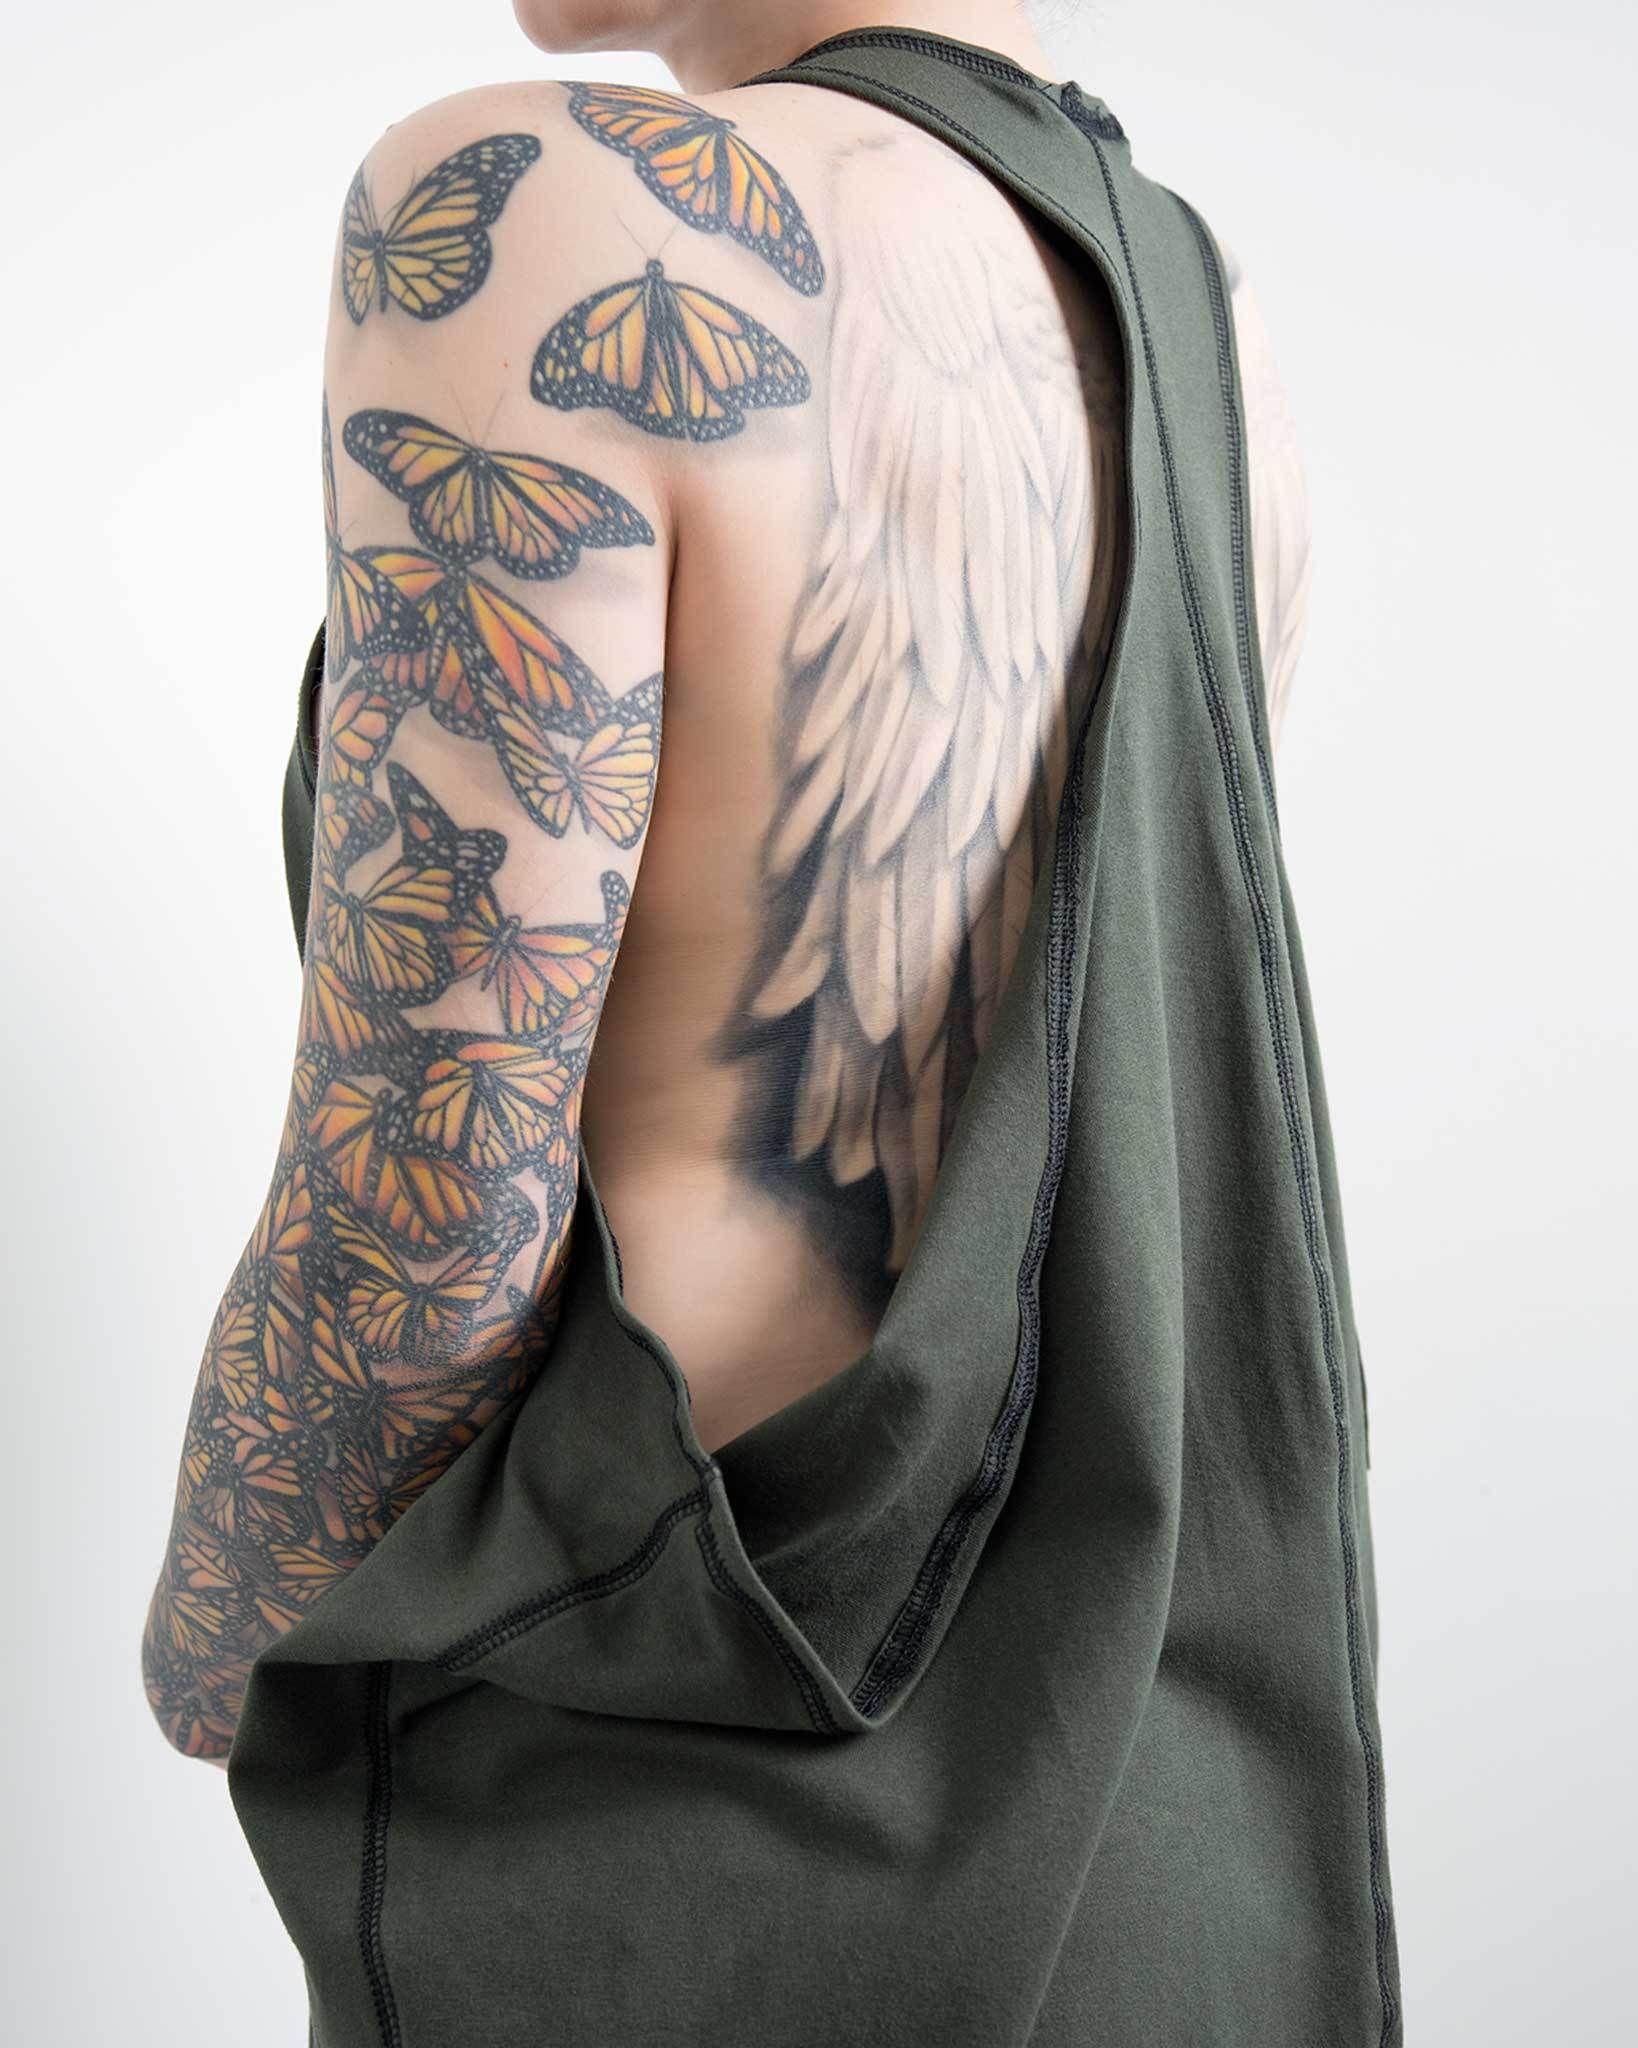 Sokaiya Tank Dress Fake tattoo sleeves, Side stomach